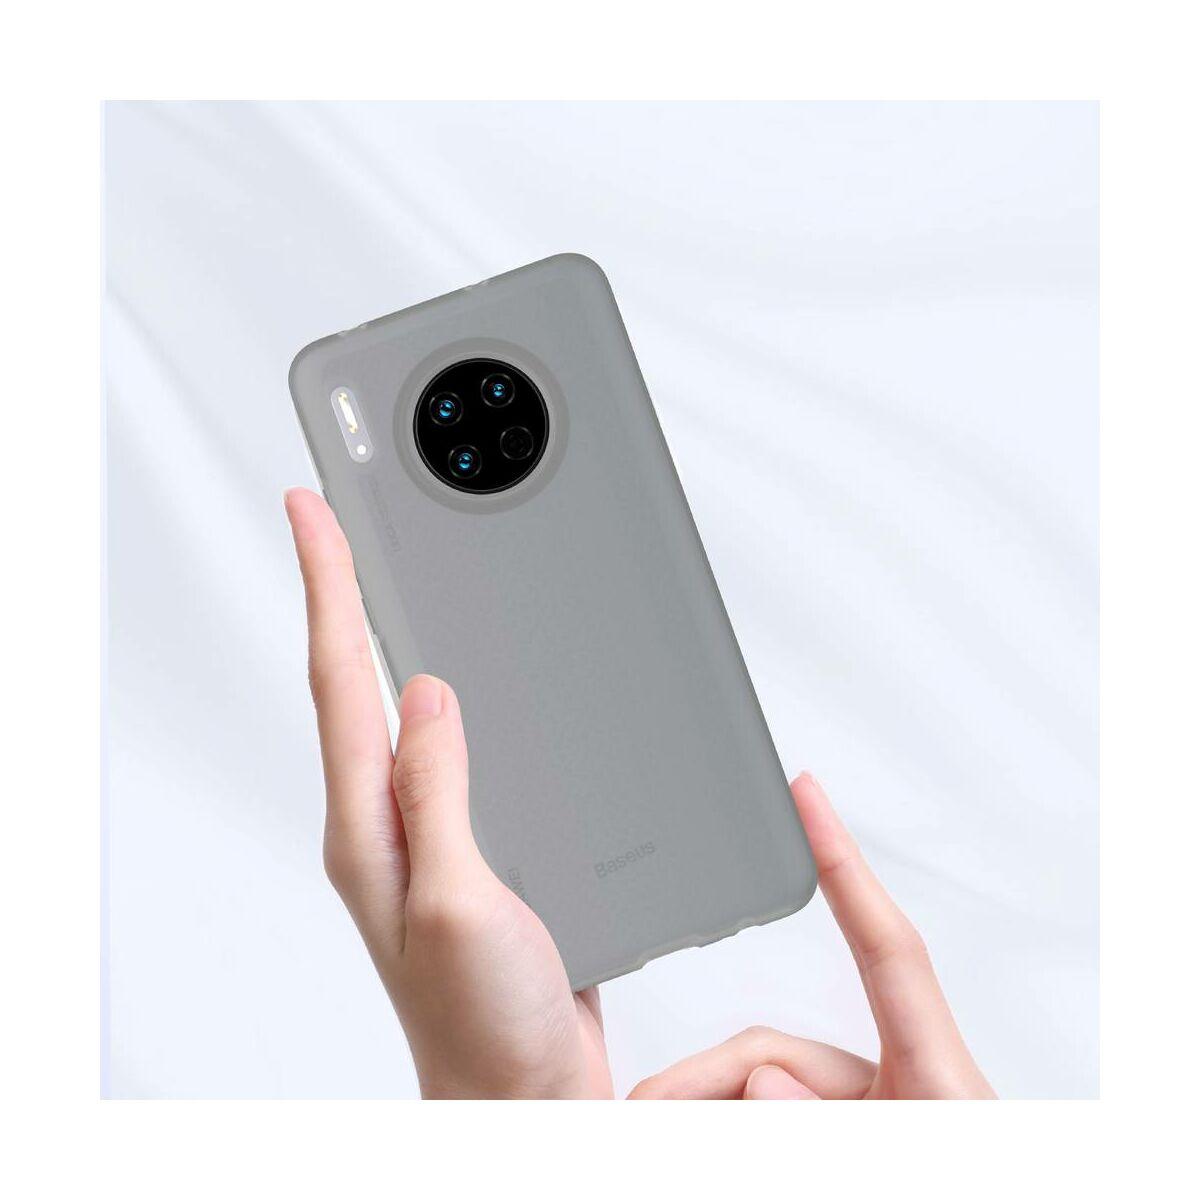 Baseus Huawei Mate 30 tok, Jelly Liquid Silica Gel, átlátszó fekete (WIHWMATE30-GD01)